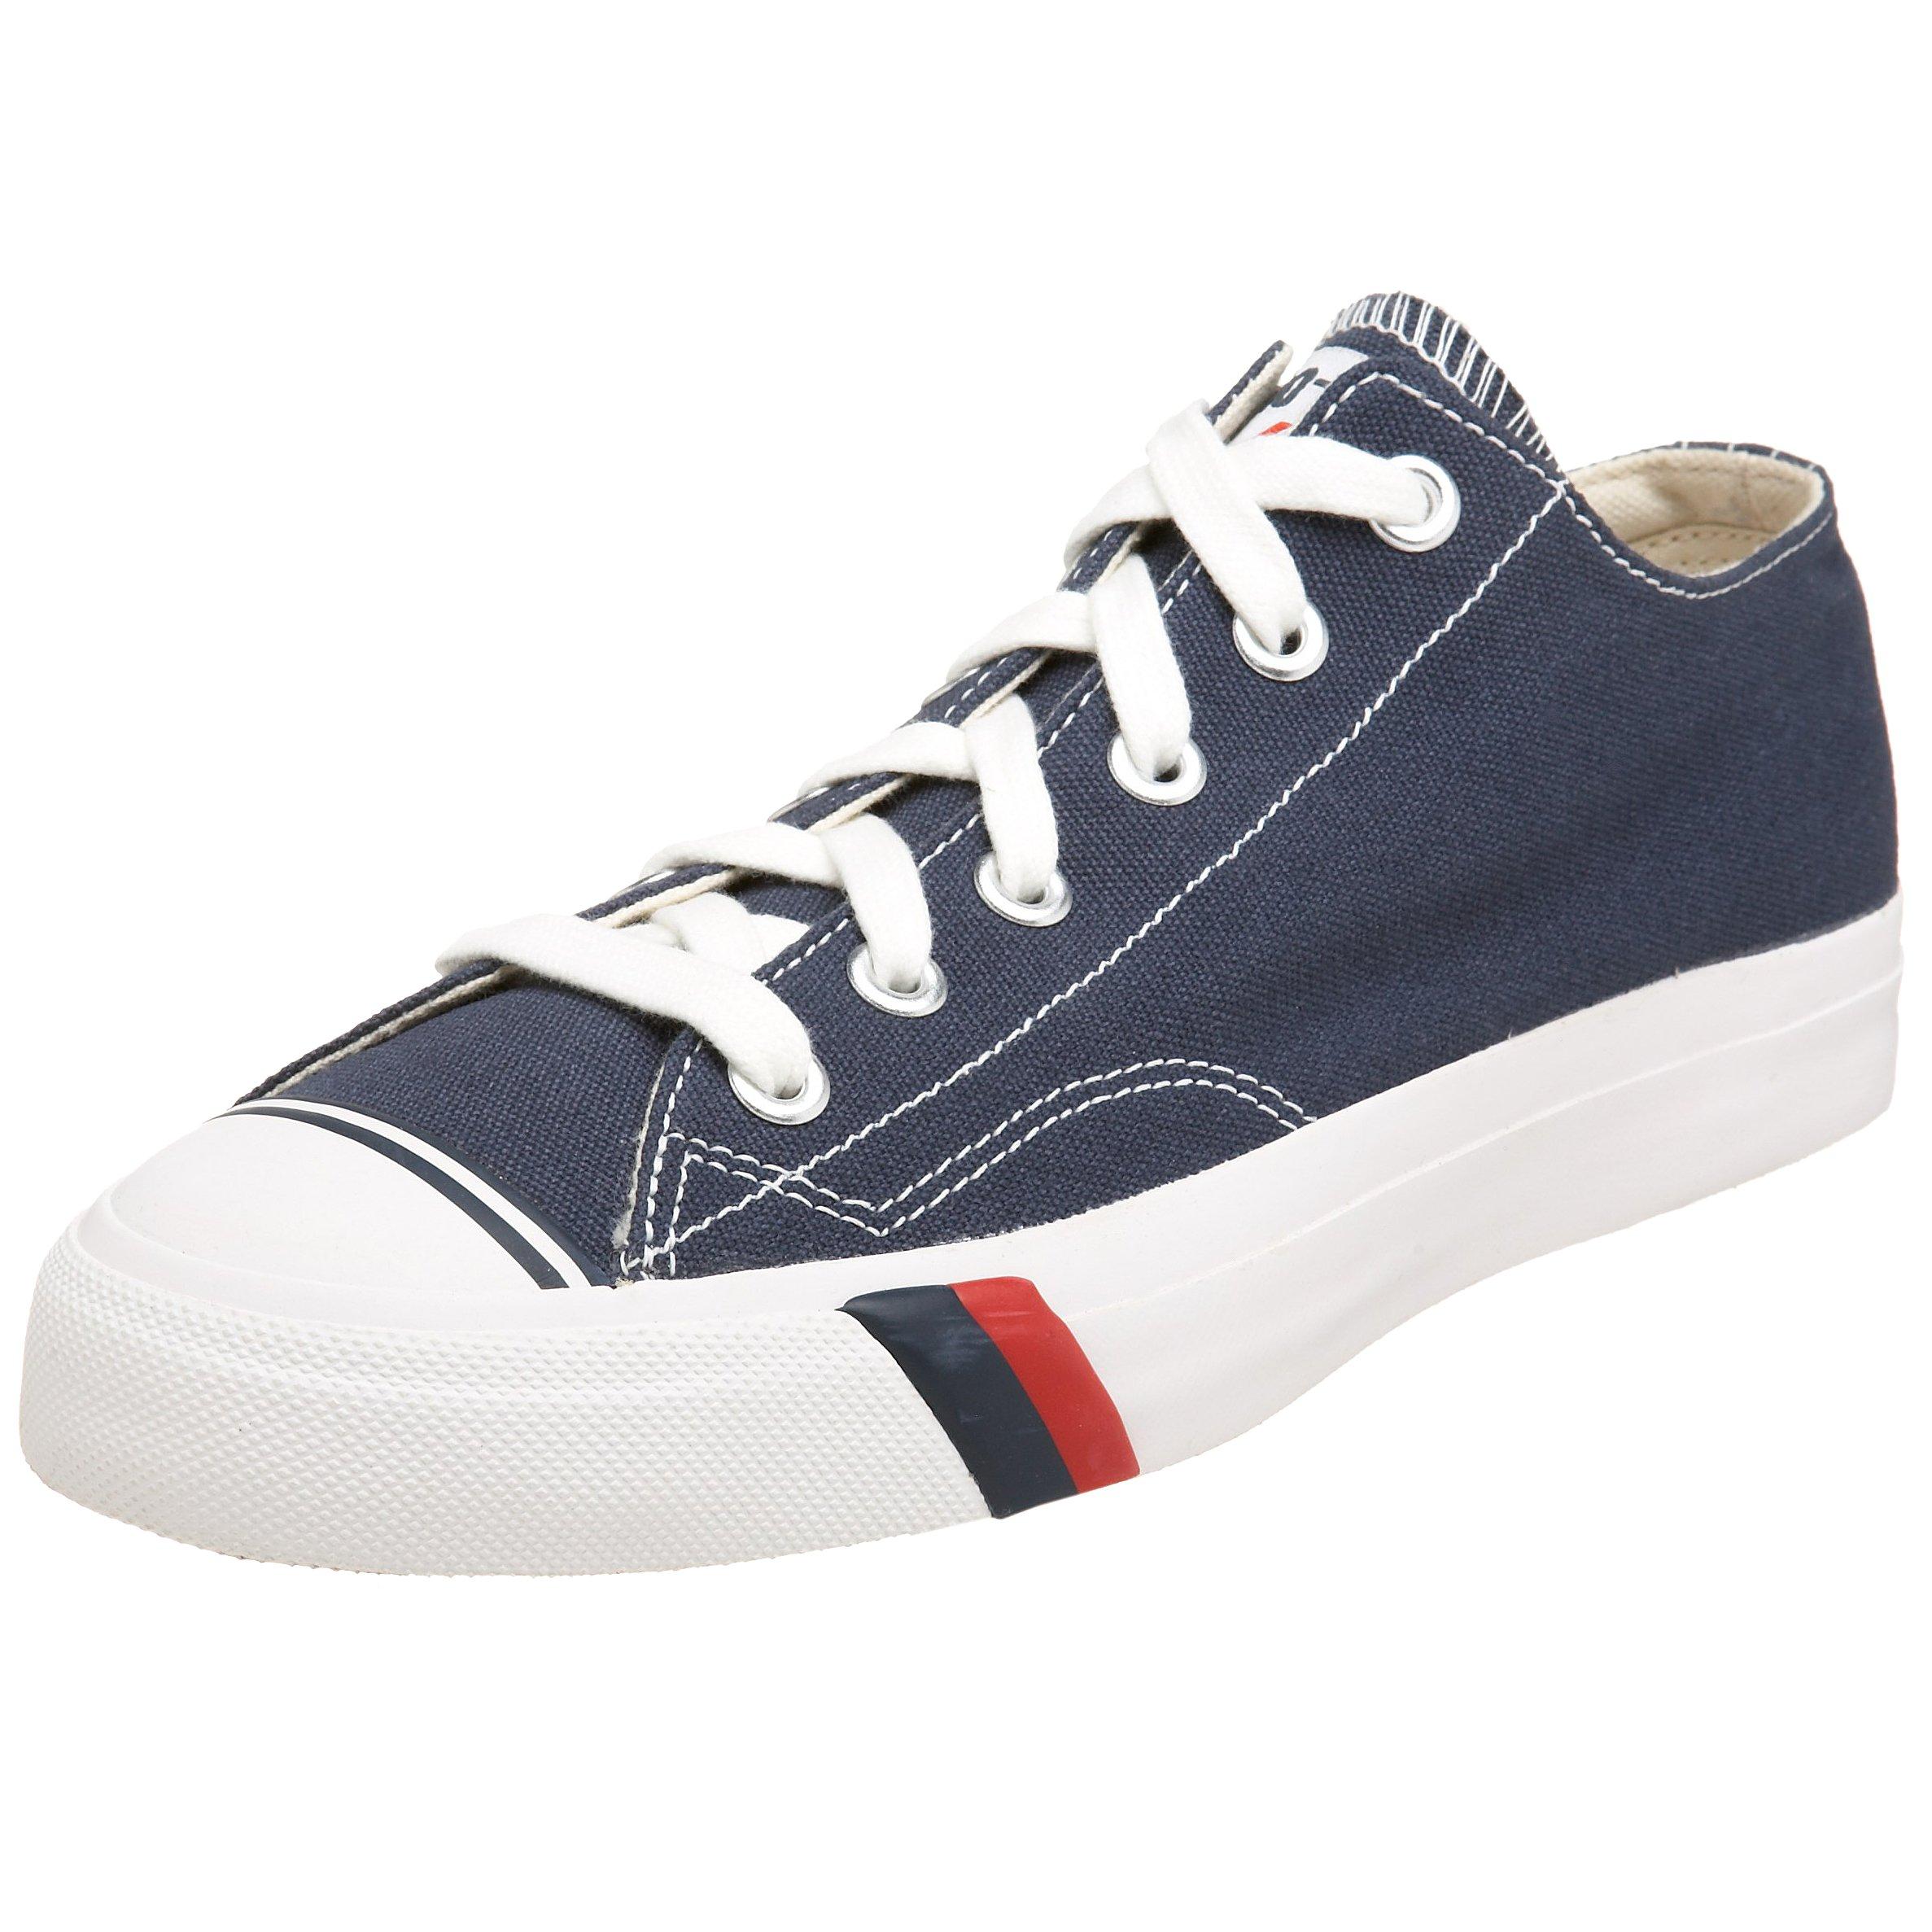 Pro-Keds Royal Lo Canvas Sneaker, Navy/White, 7 B(M) US Women/5.5 D(M) US Men